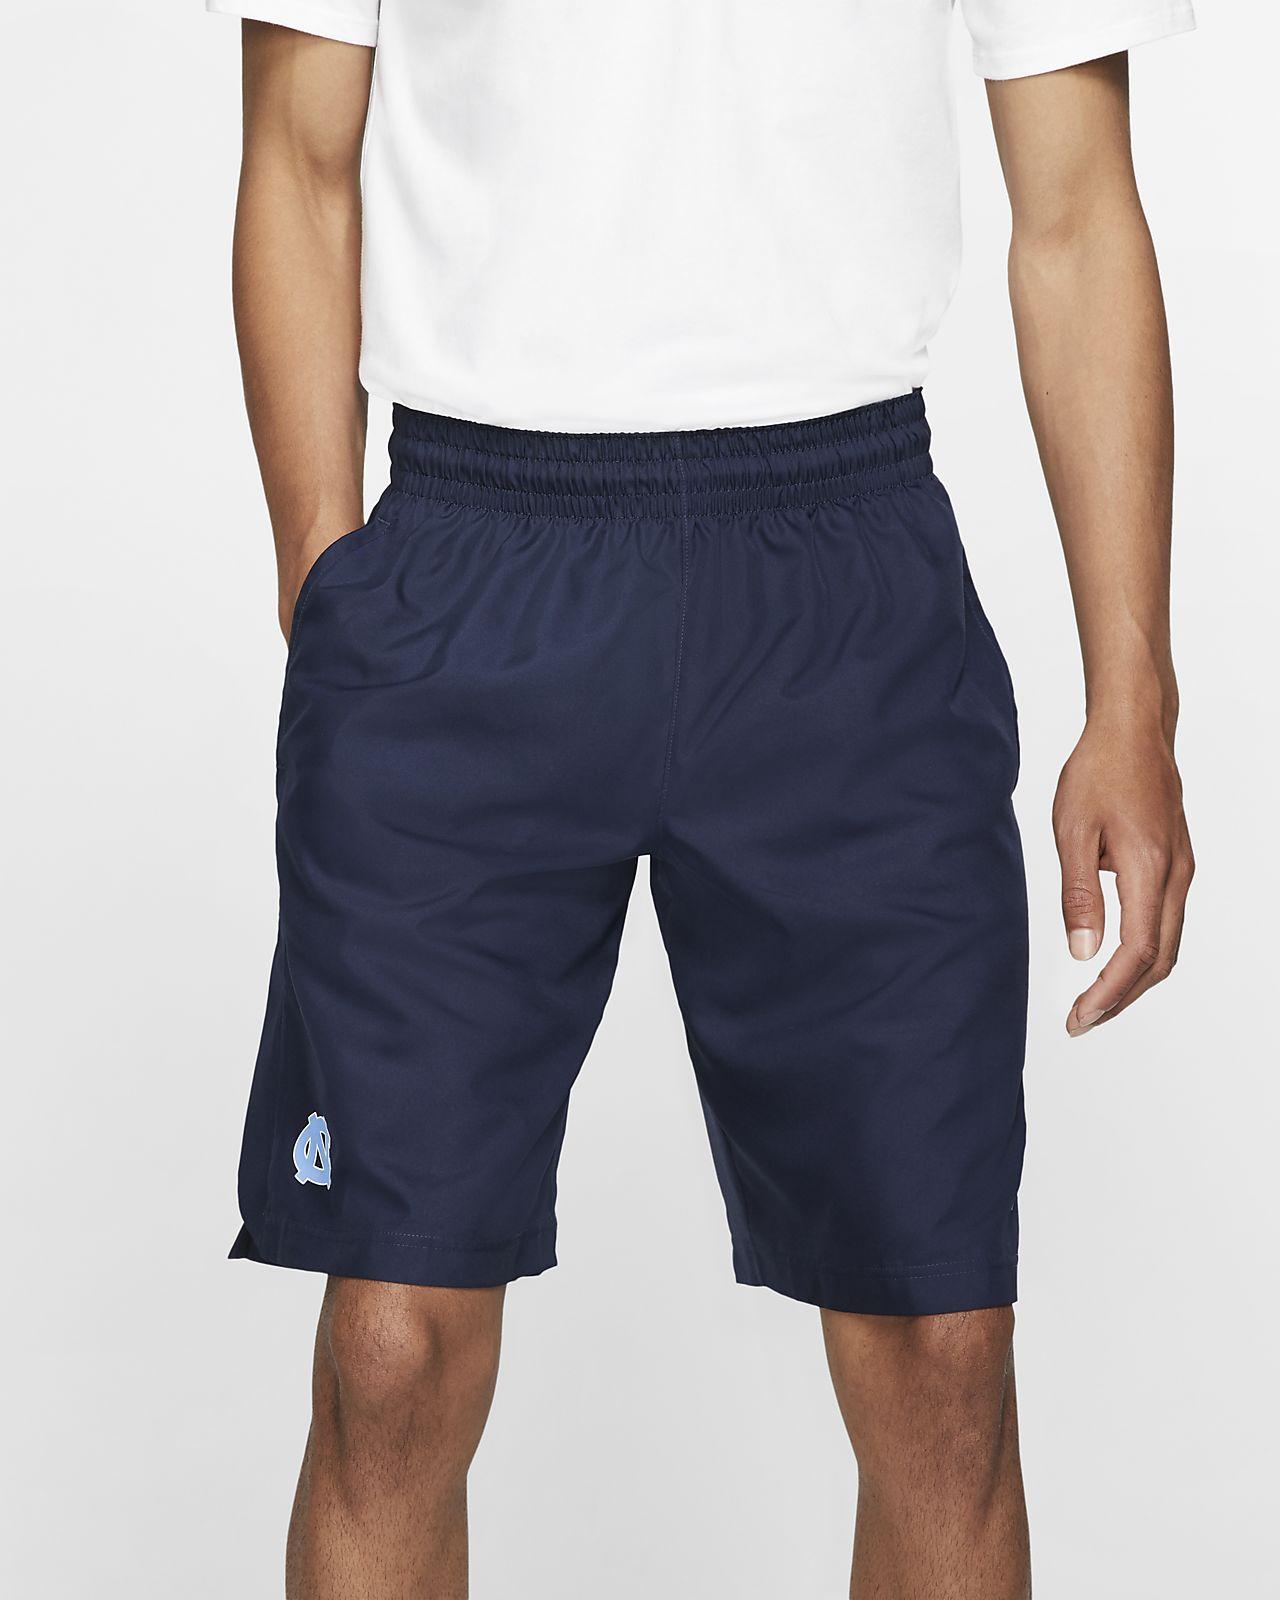 Jordan 23 Alpha Dri-FIT (UNC) Men's Training Shorts